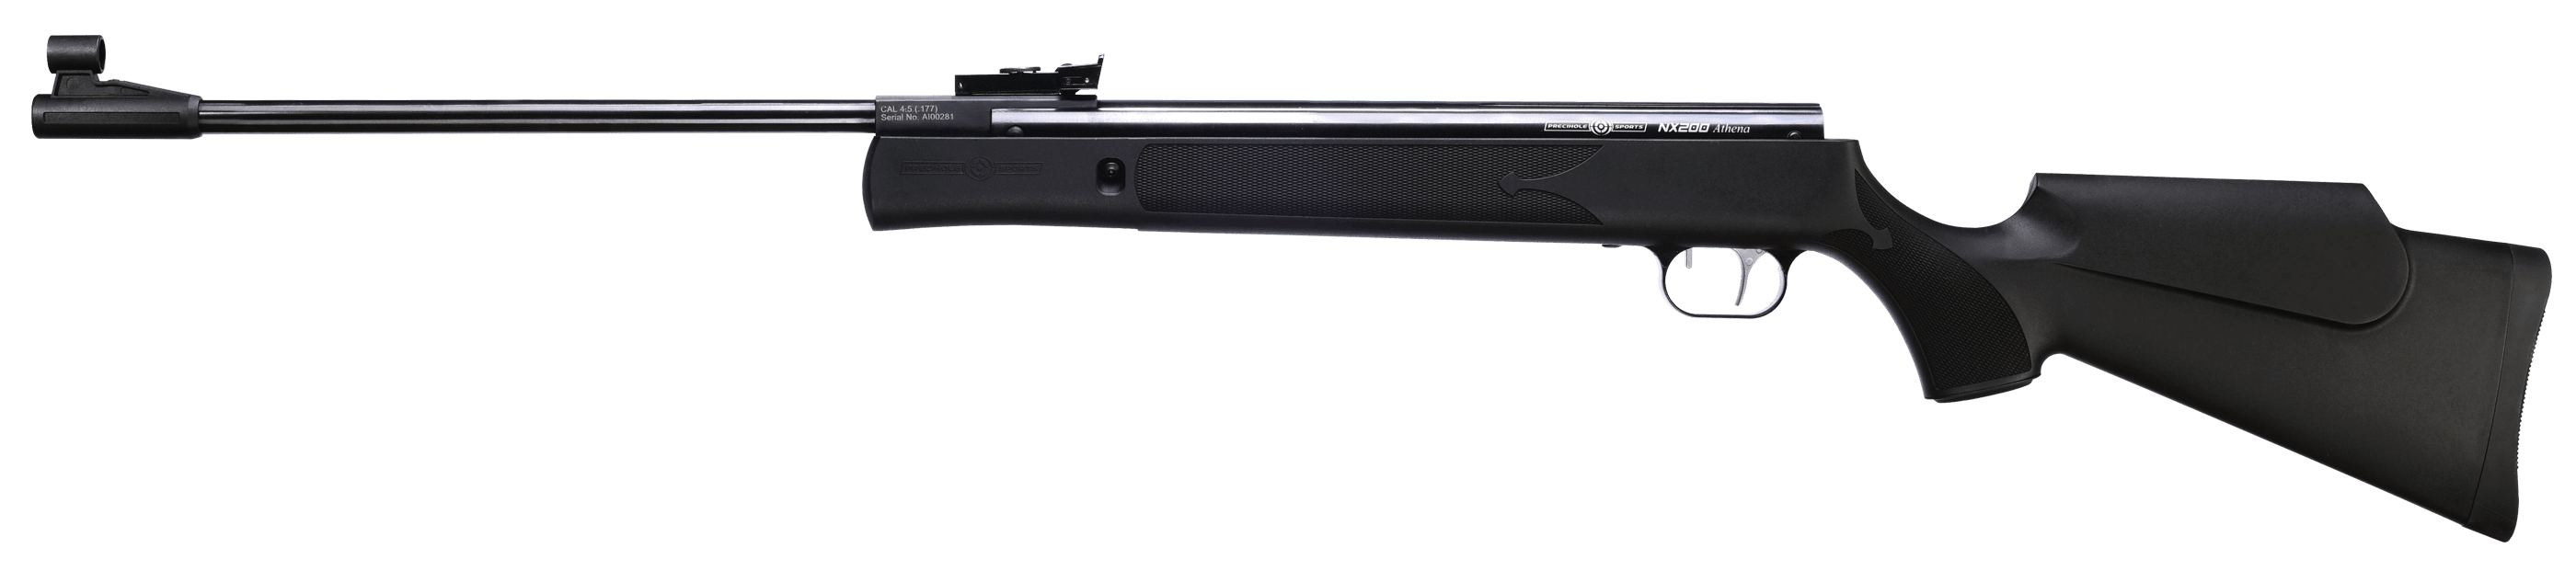 NX200-Athena-air-rifle-break-barrel